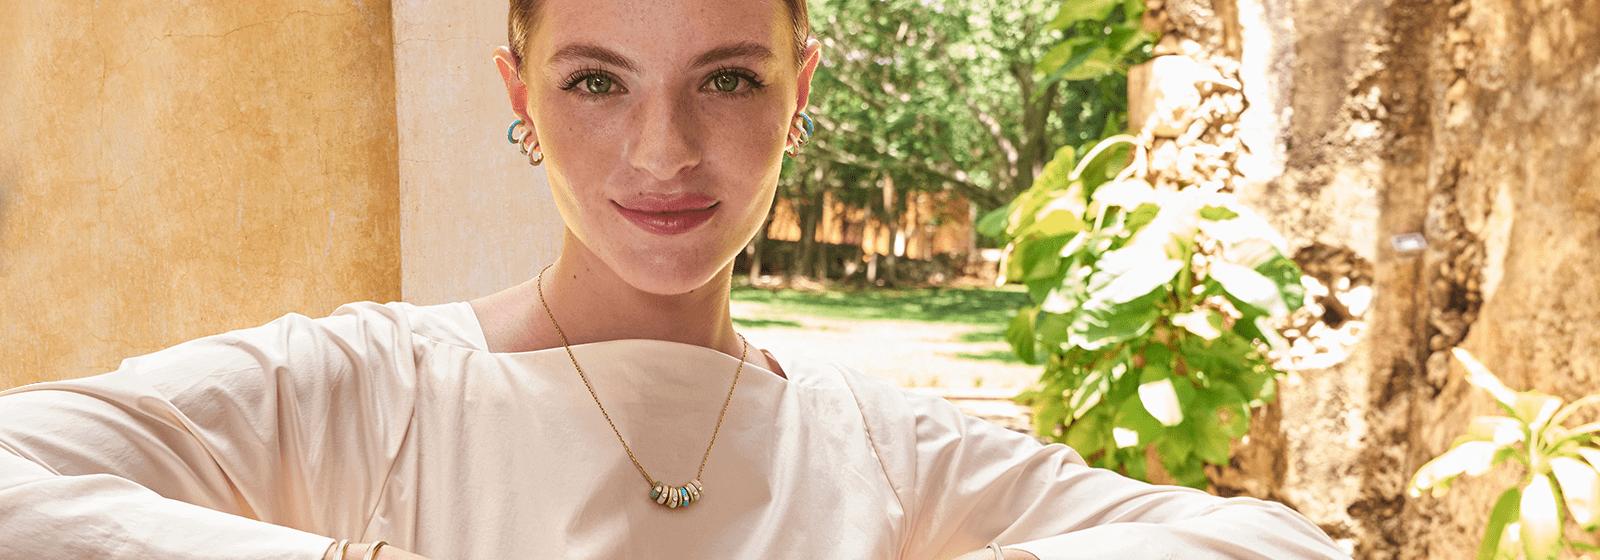 Mujer latina con joyas Yanbal